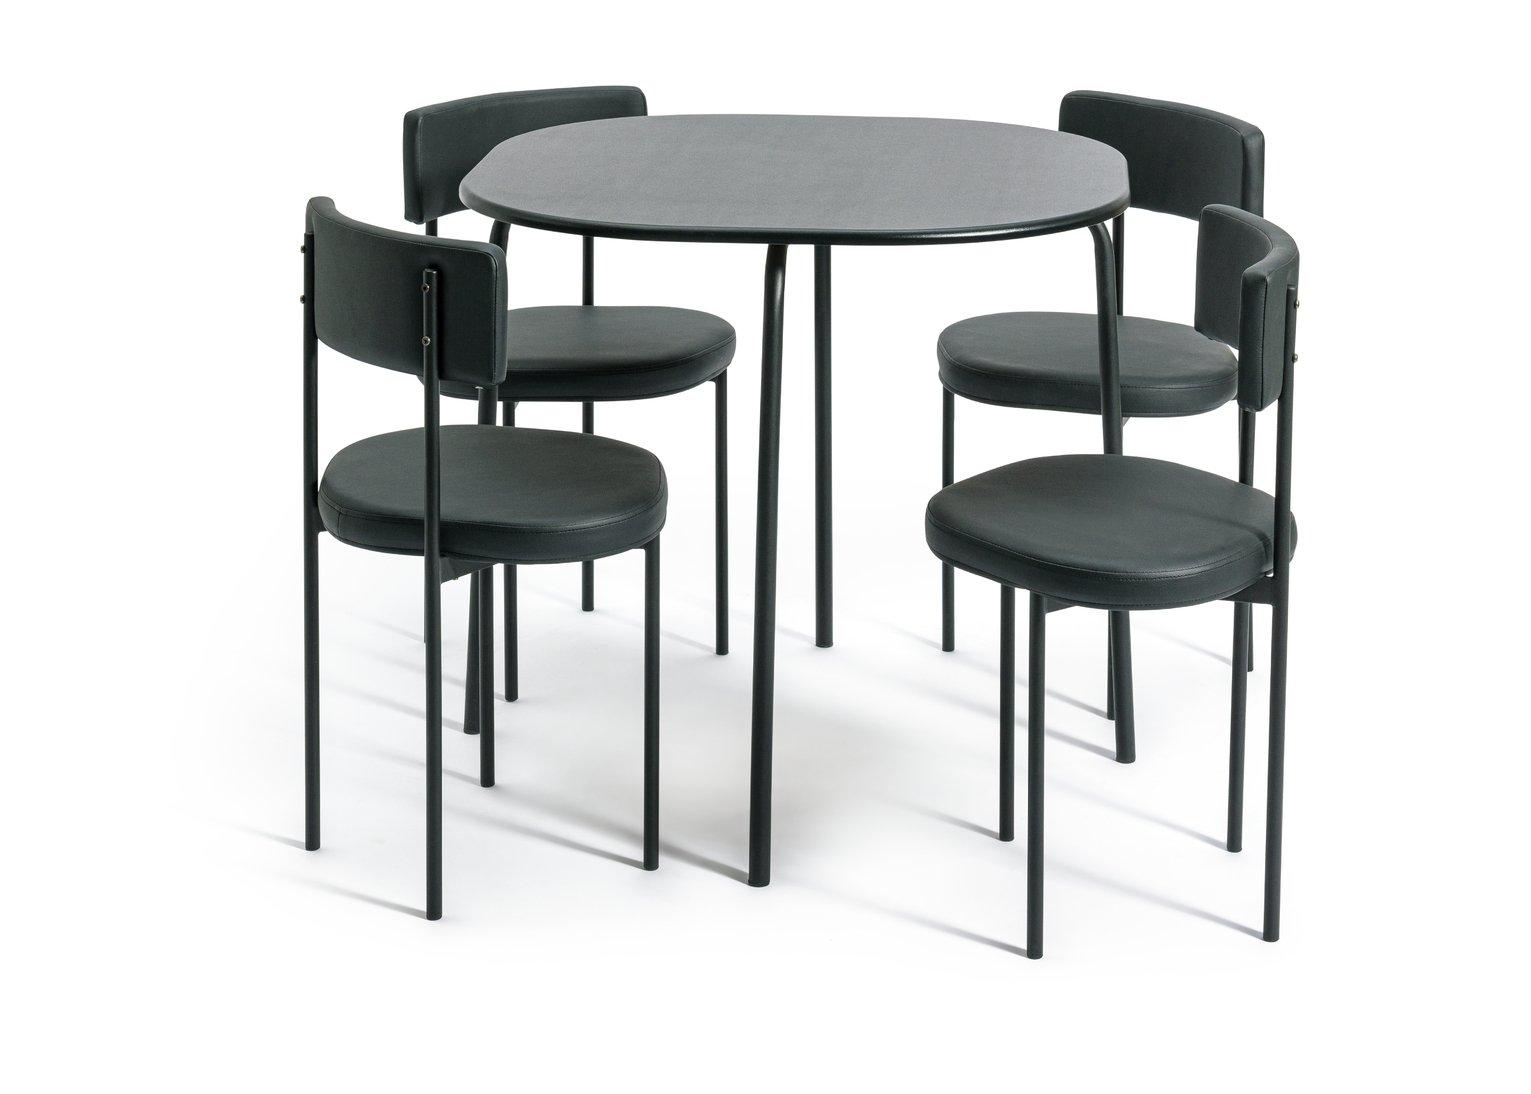 Habitat Jayla Wood Effect Dining Table & 4 Black Chairs